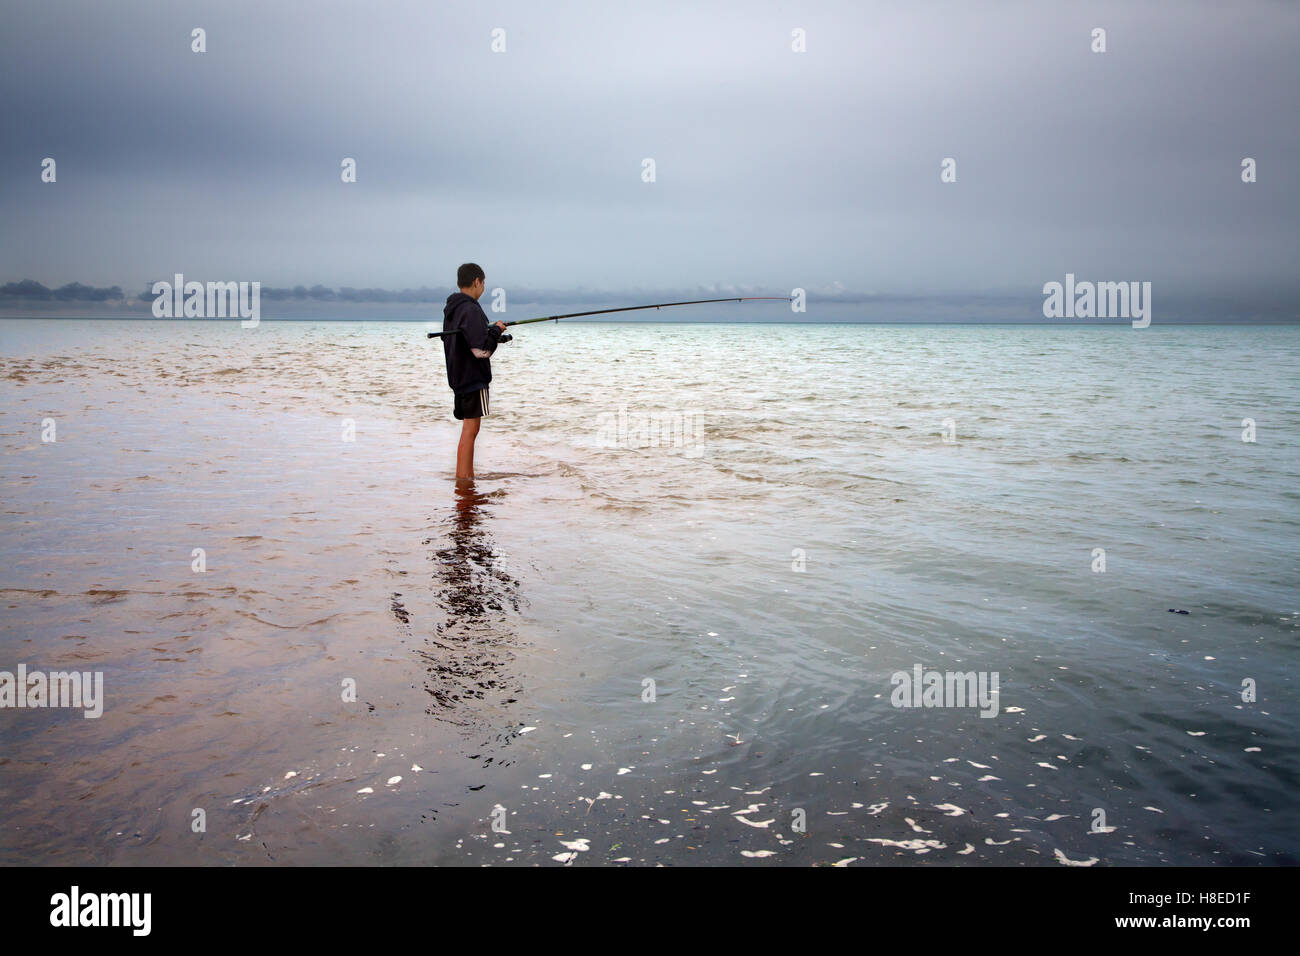 Kyrgyzstan - nomadic child fishing in Issyk-Kul lake  -  Travel people Central Asia - Stock Image